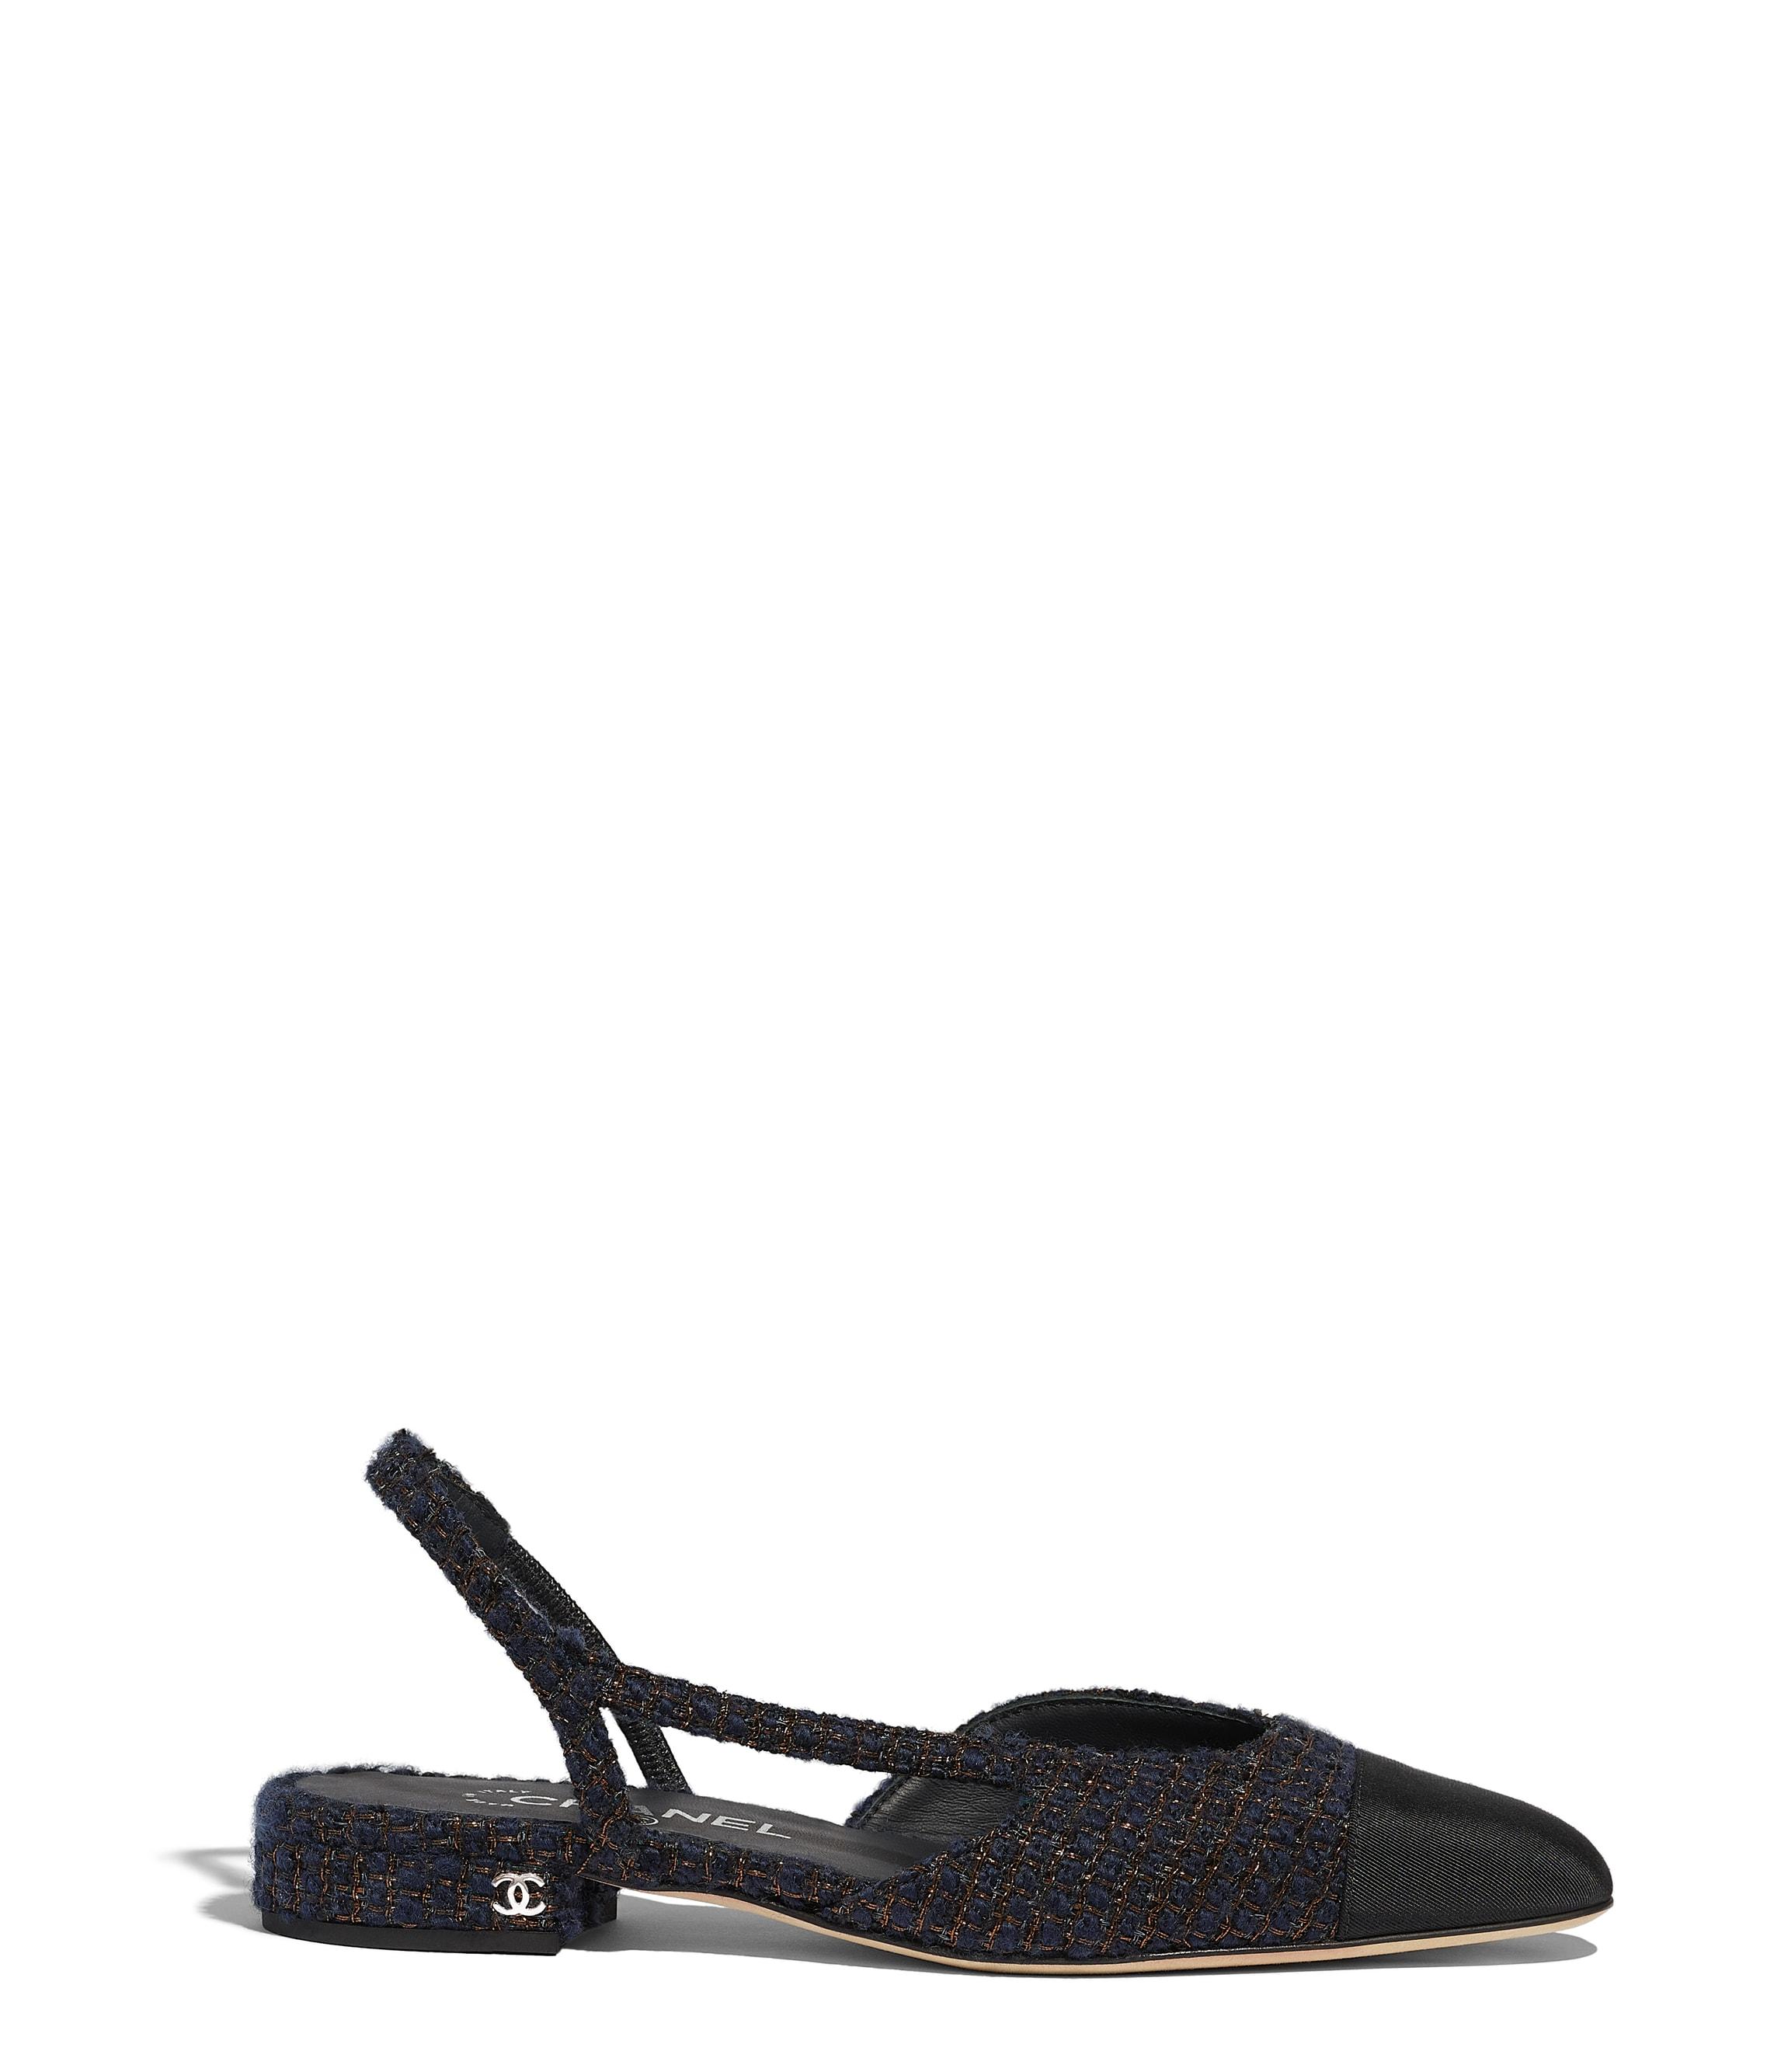 aacb9a2e112 Pumps & Slingbacks - Shoes - CHANEL